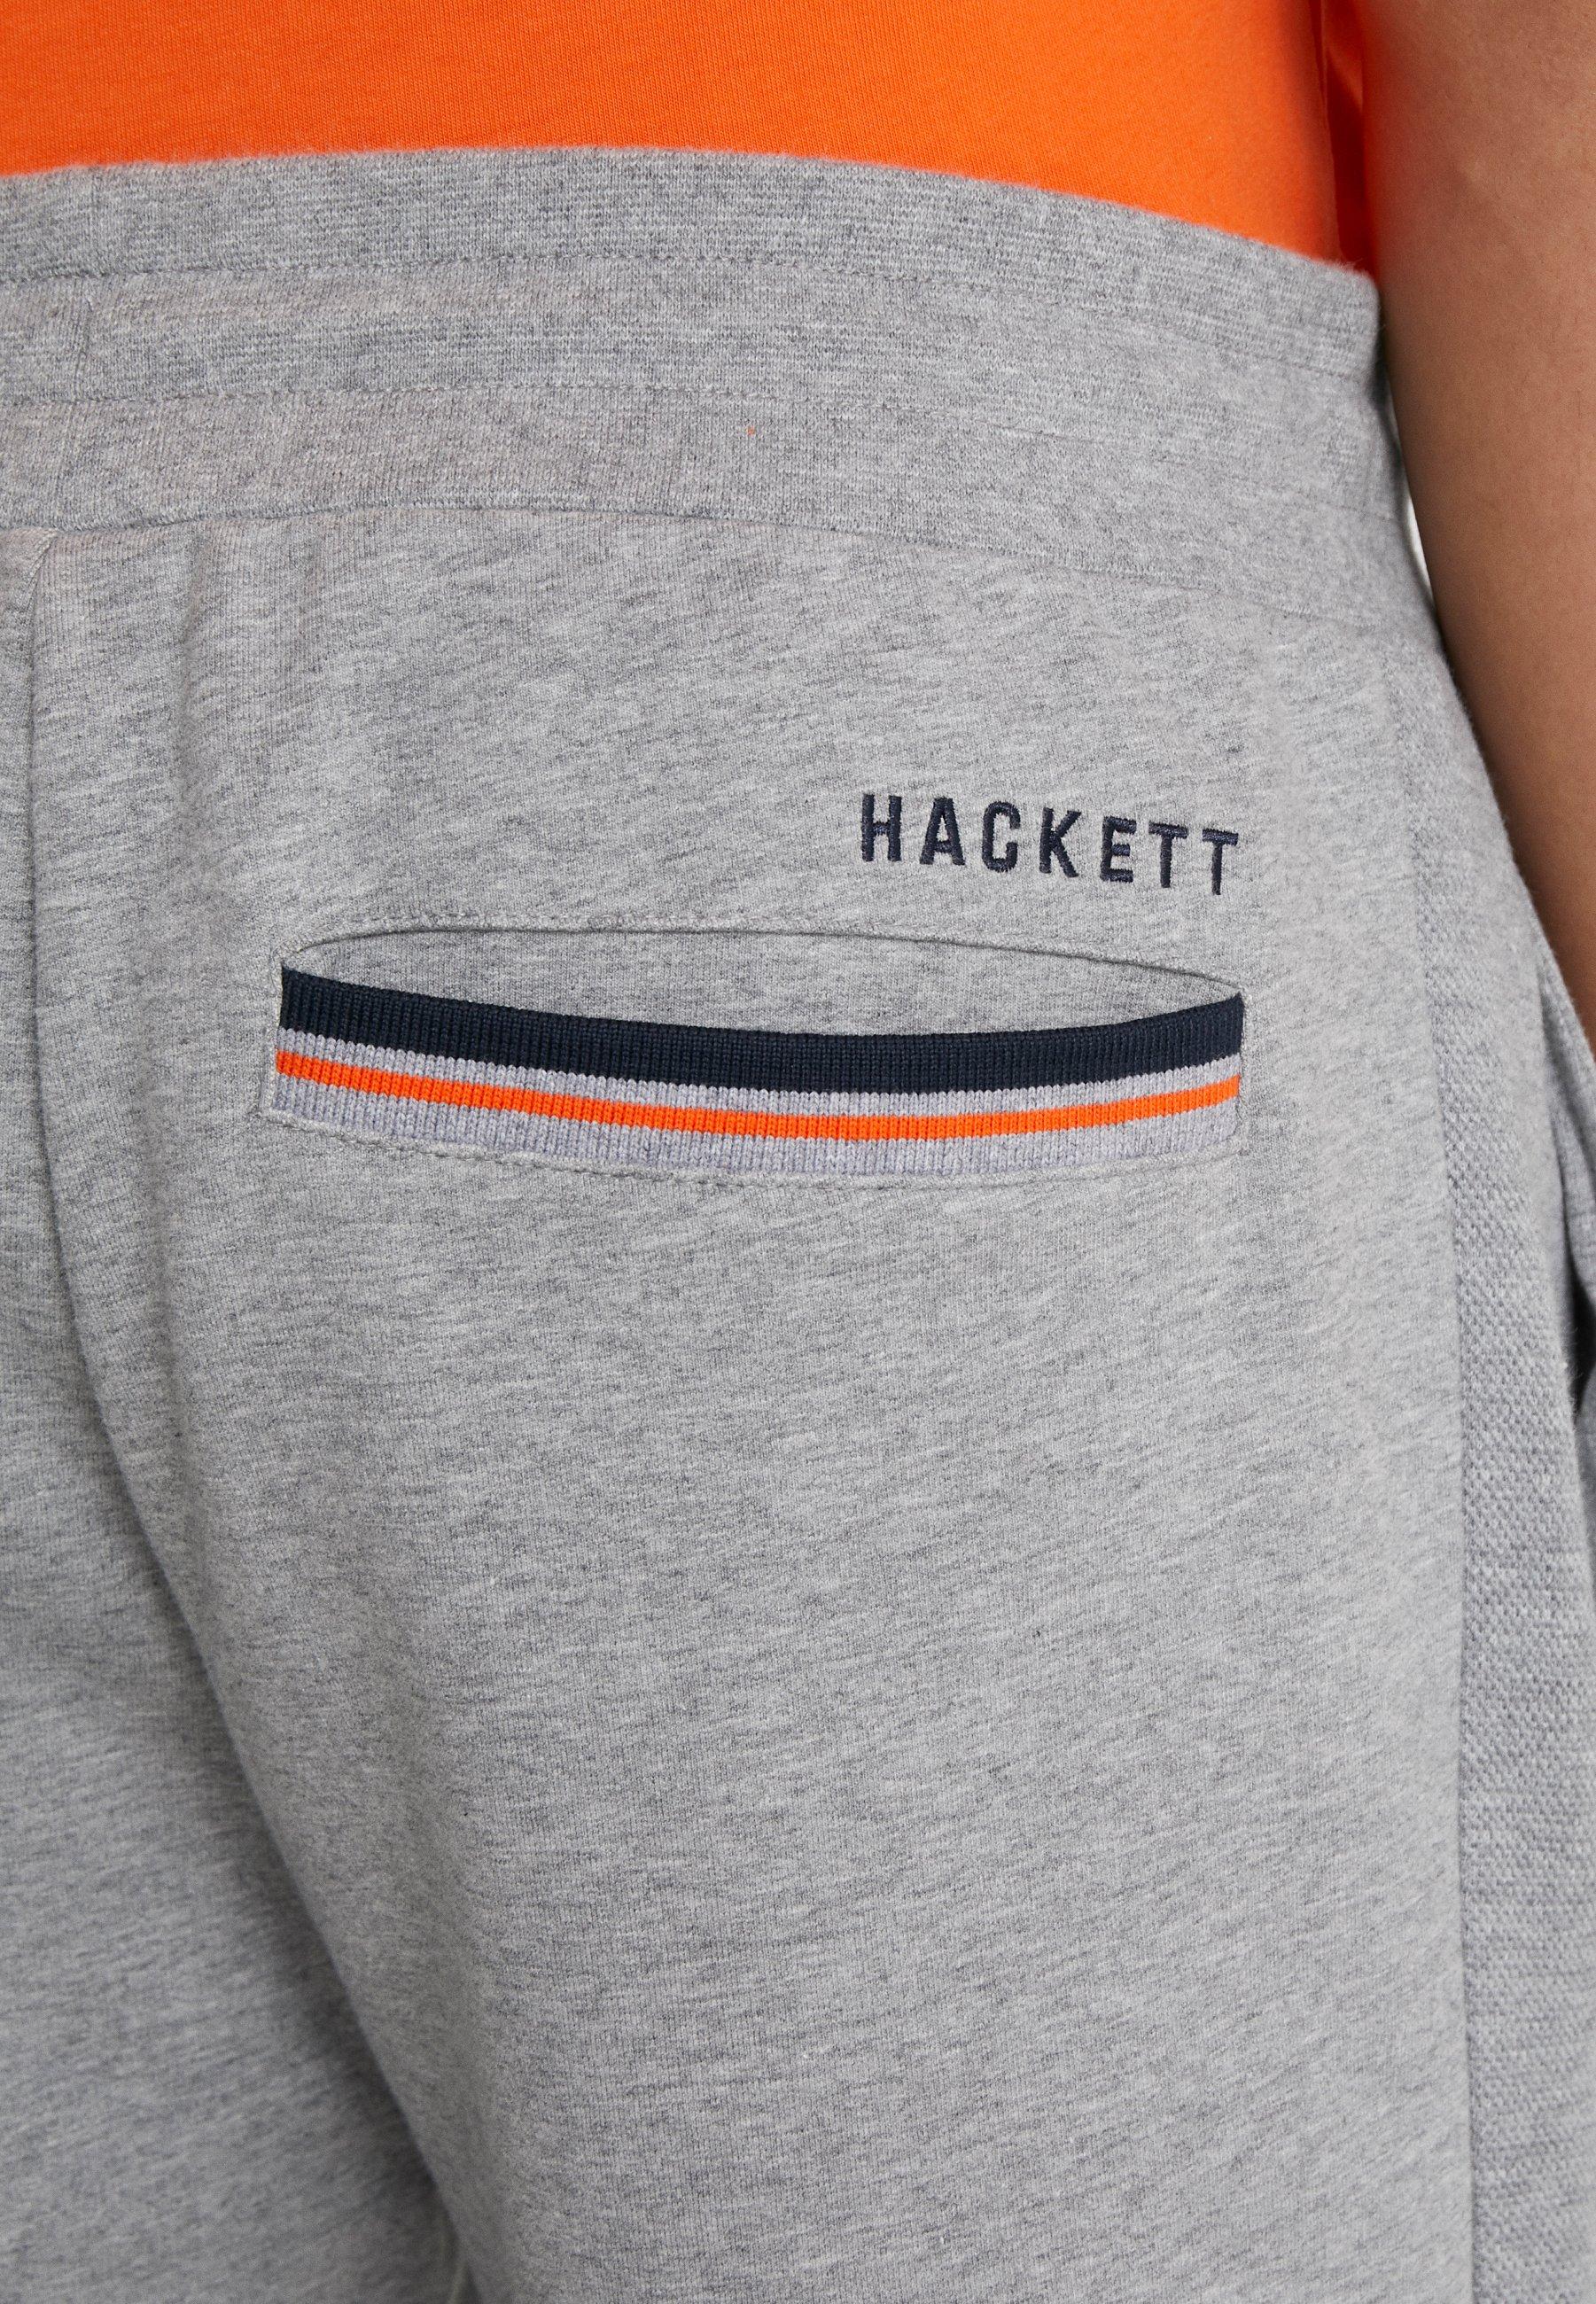 Hackett Aston Martin Racing AMR TRACK SHORTS - Pantaloni sportivi - grey marl